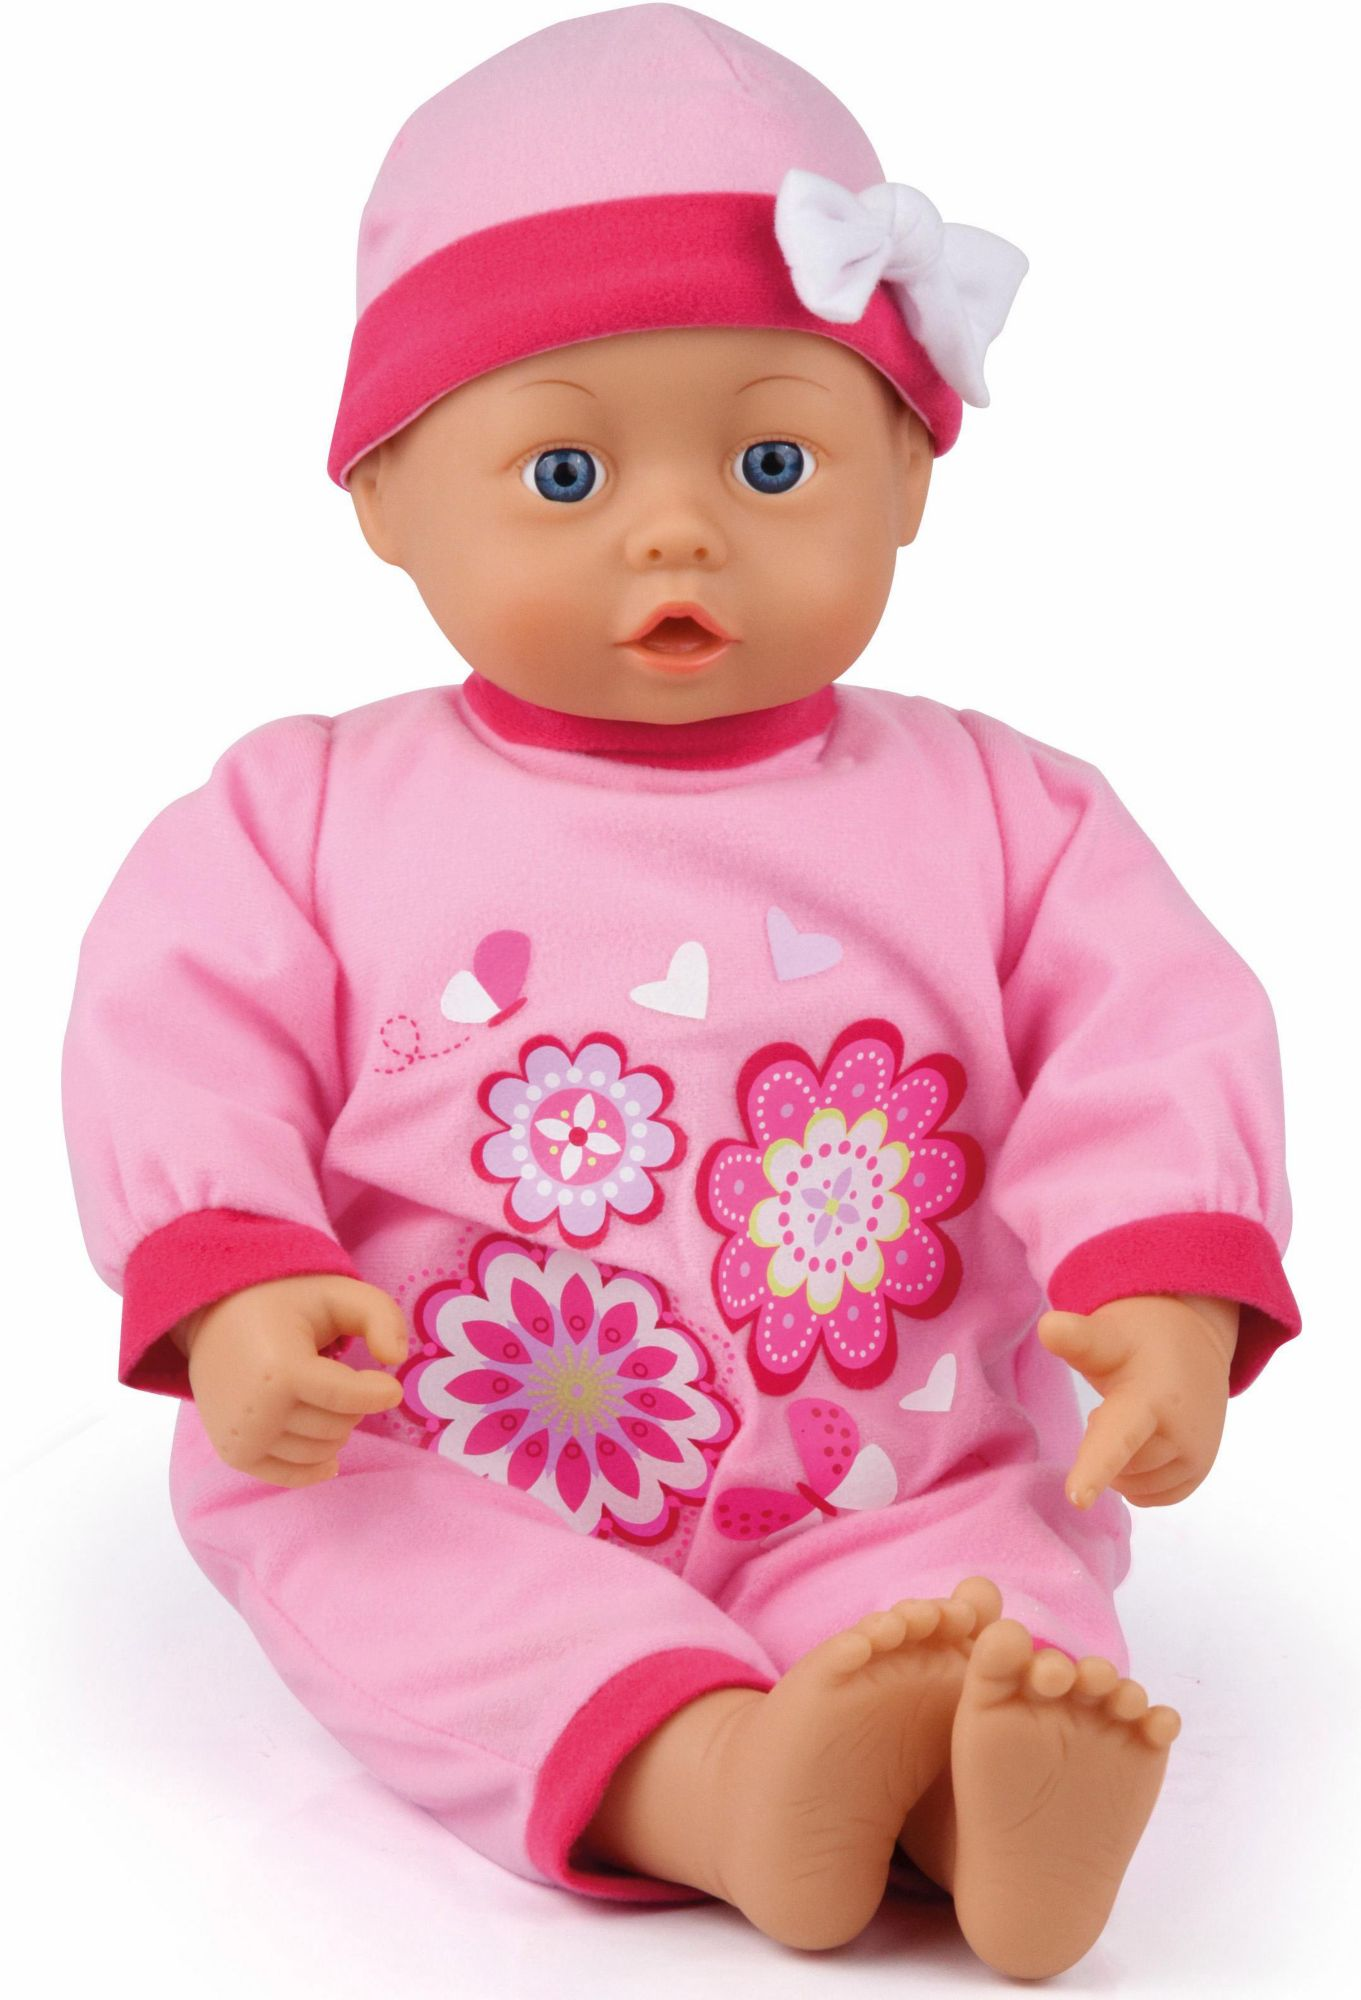 BAYER Bayer Design Babypuppe mit Funktion, »First Words Baby, rosa 46 cm«